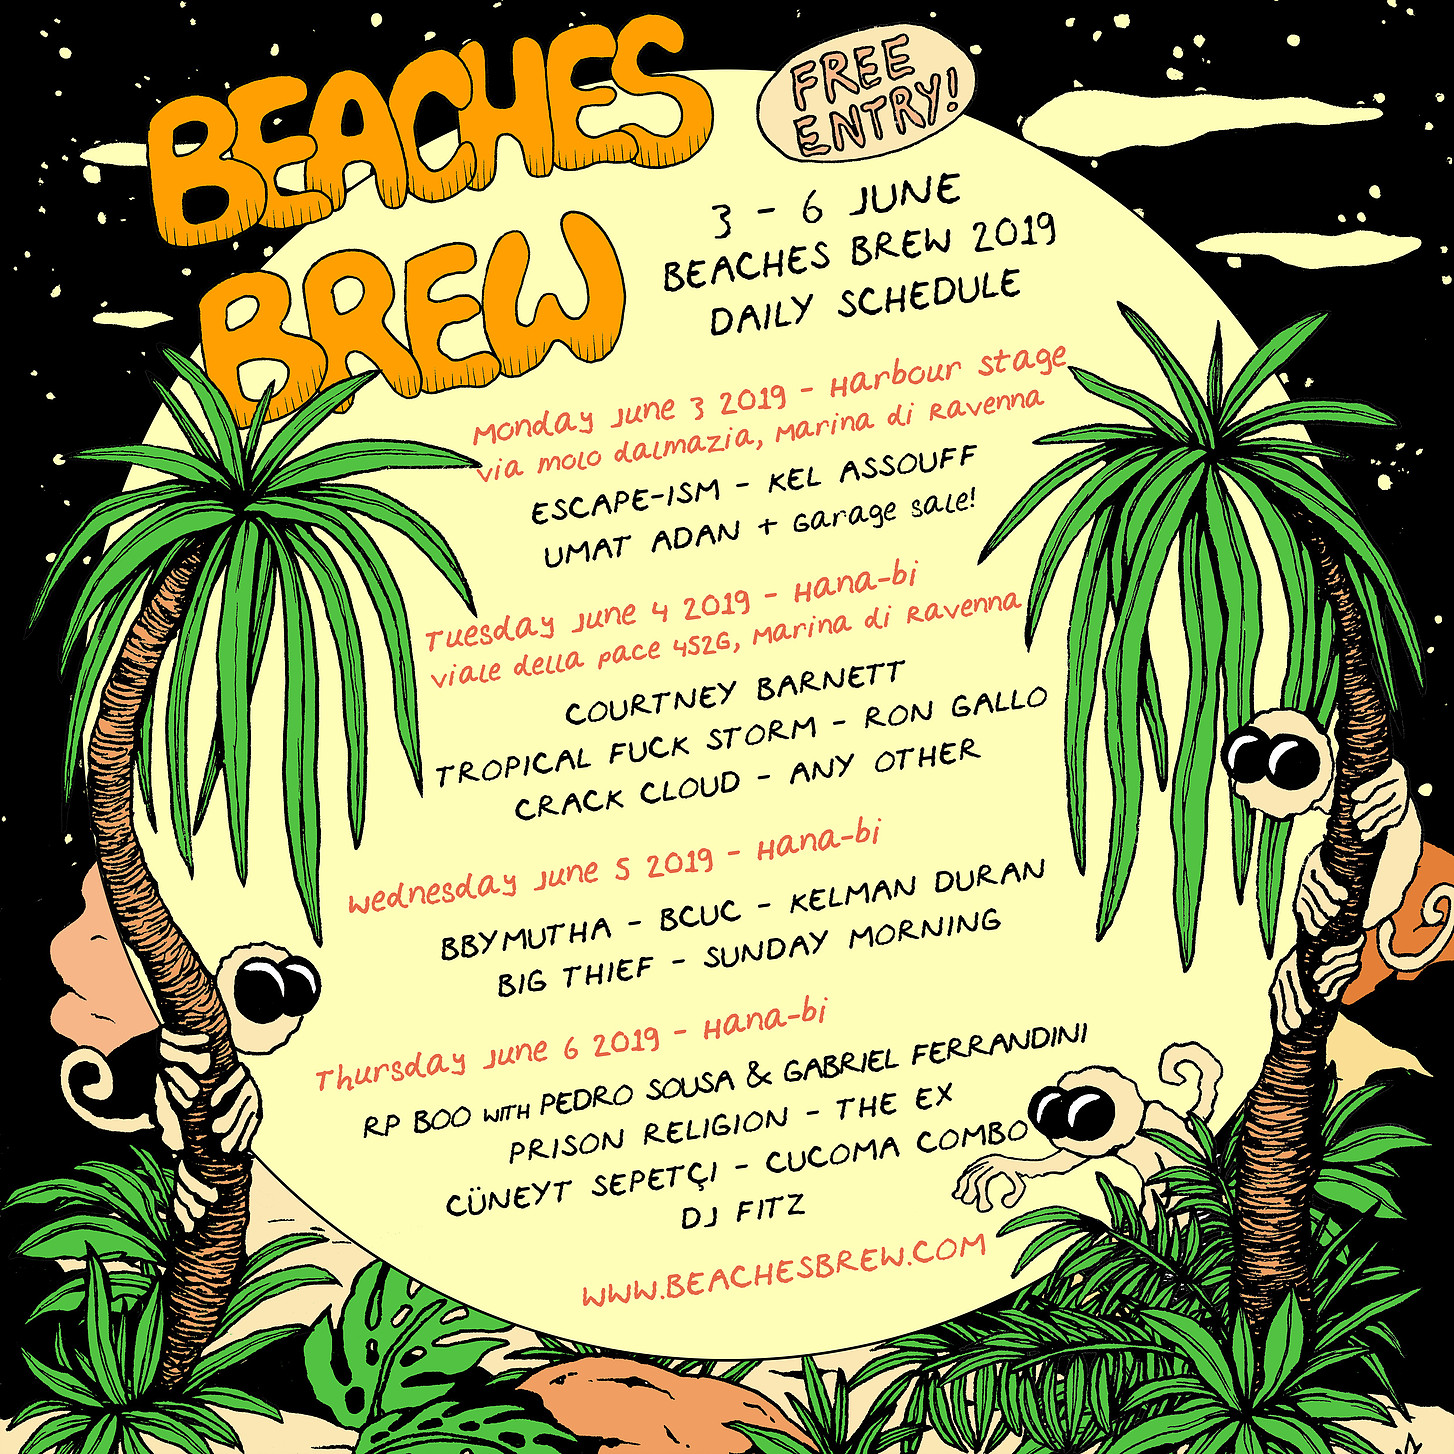 Beaches Brew Festival | 2019 Programme